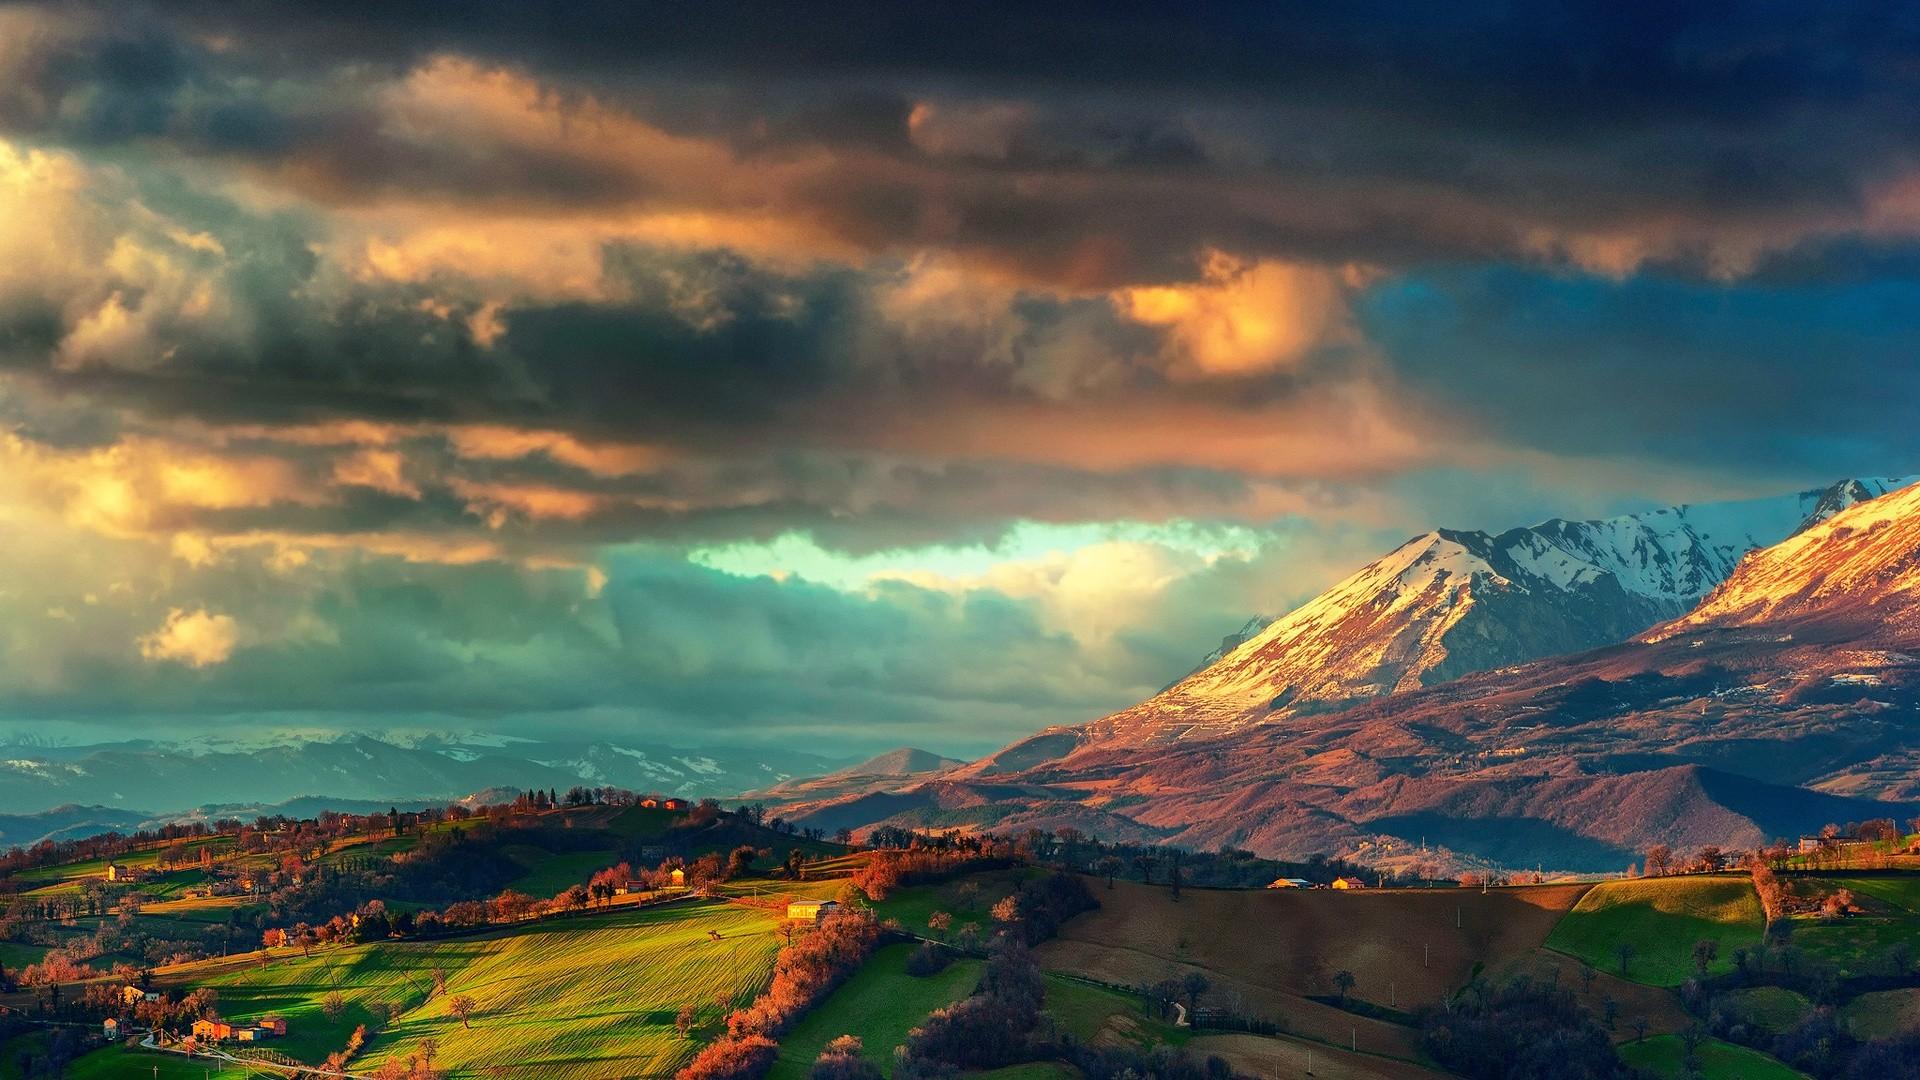 nature wallpaper - desktop wallpaper - social wallpapering